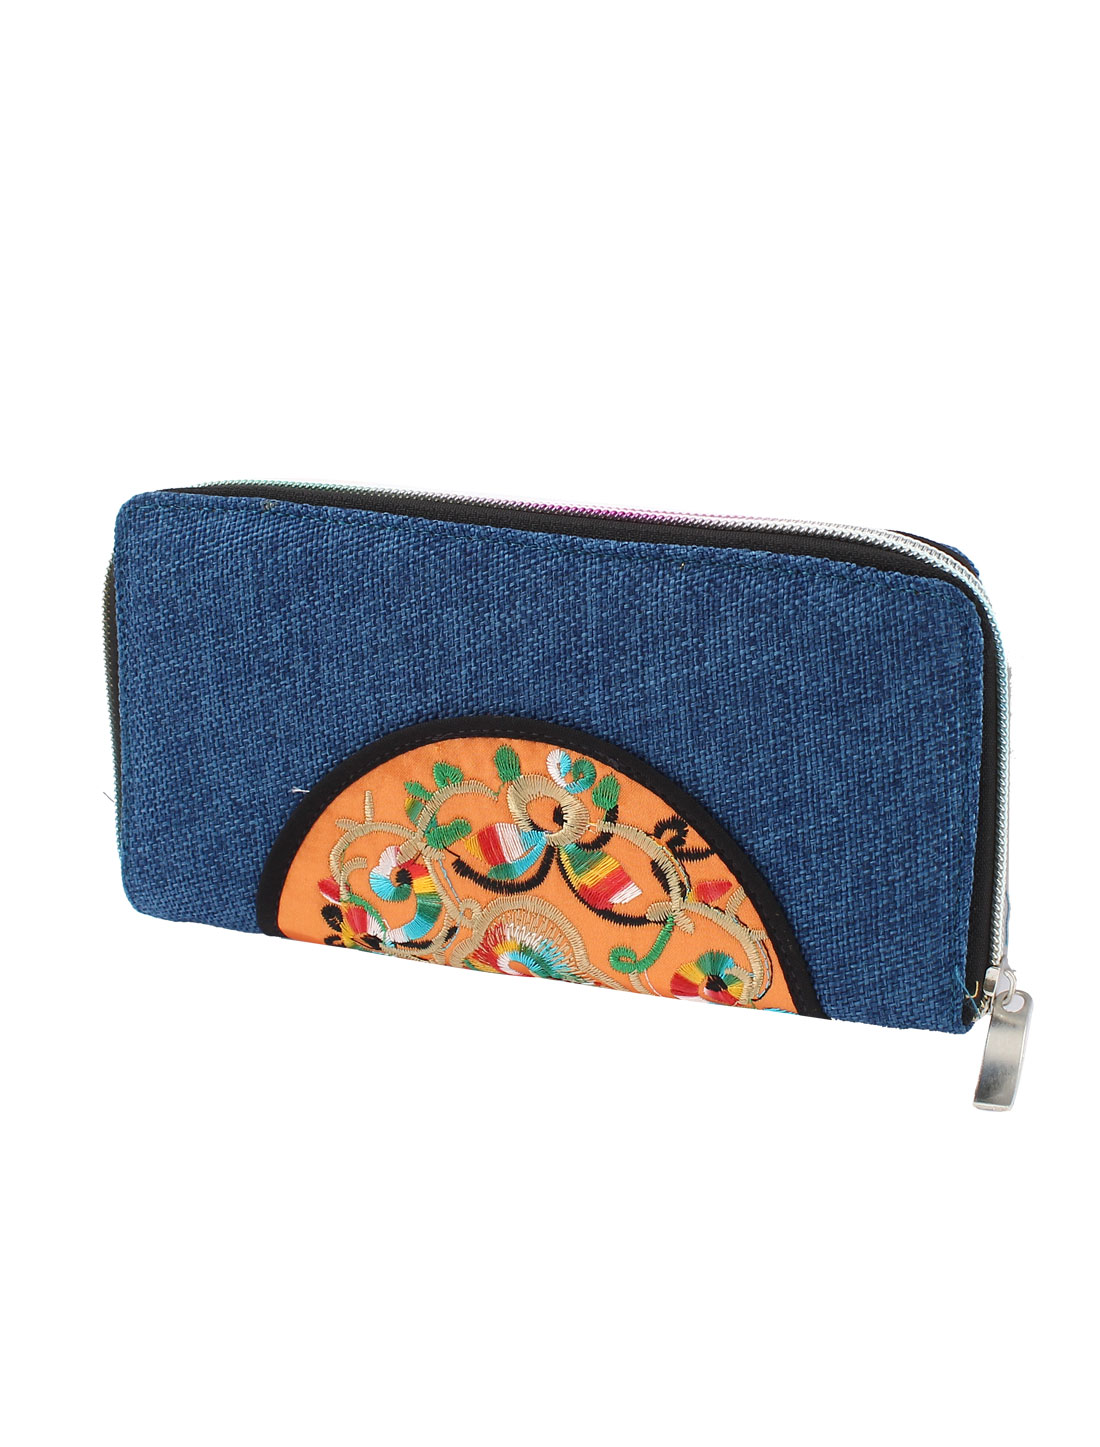 Dark Blue Linen Rectangle Design Floral Pattern Zipper Closure Wallet Purse for Ladies